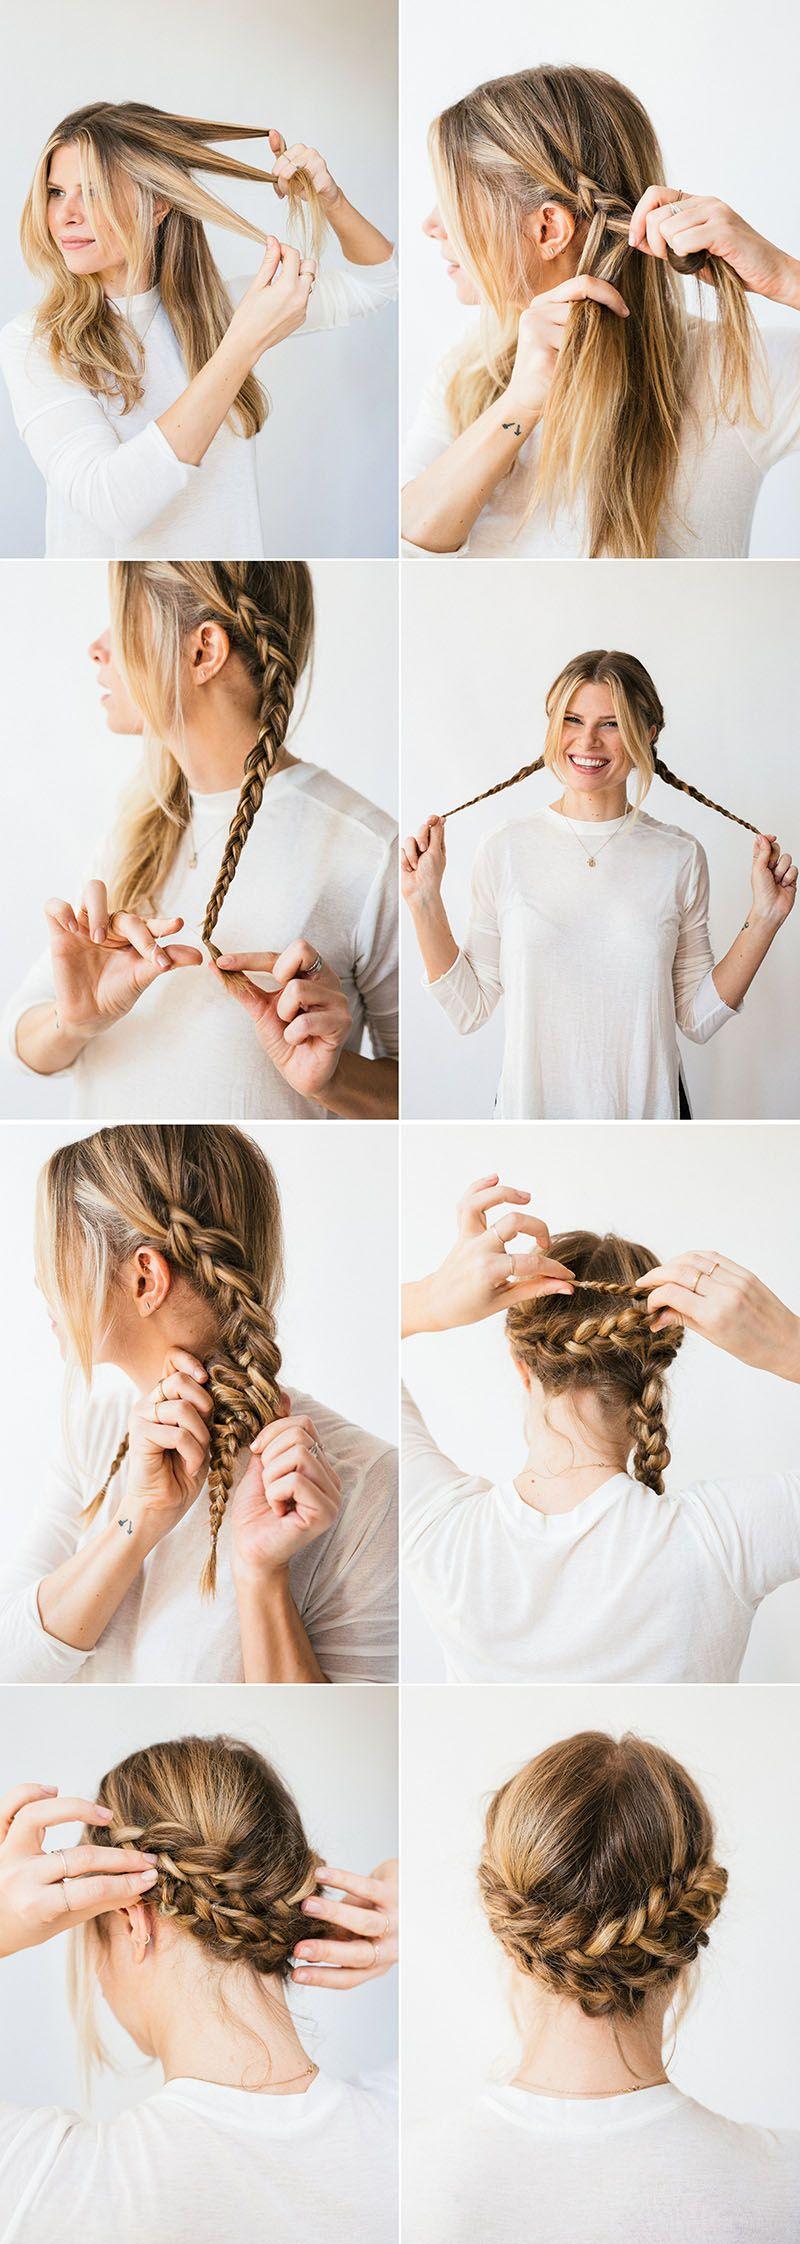 Horseshoe braid simple braids updo and romantic